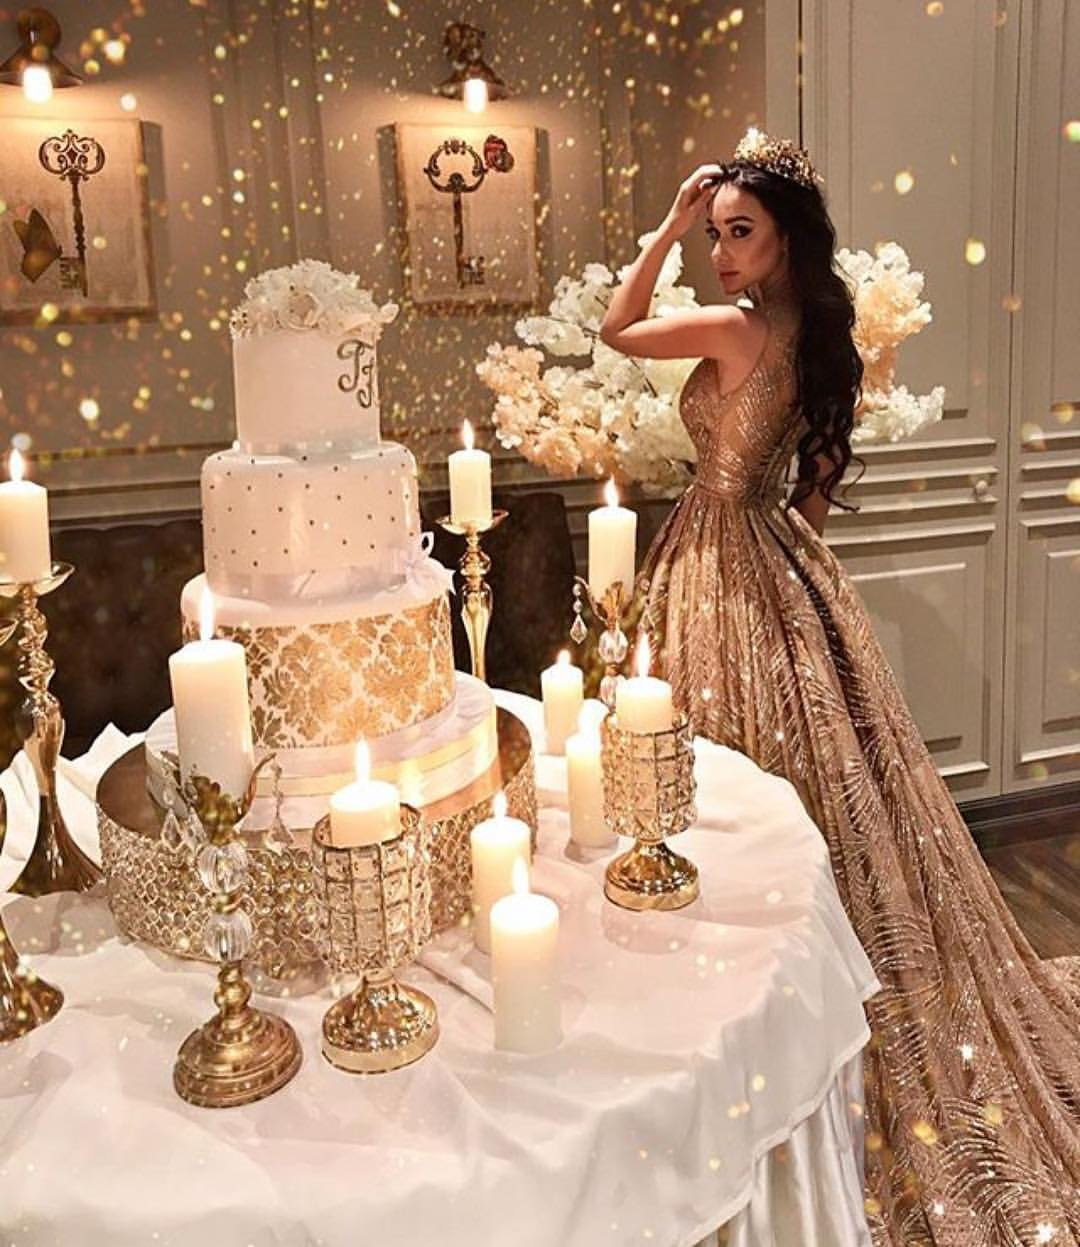 Opulent-Treasures-bling-wedding-cake-billionwomanofficial.JPG